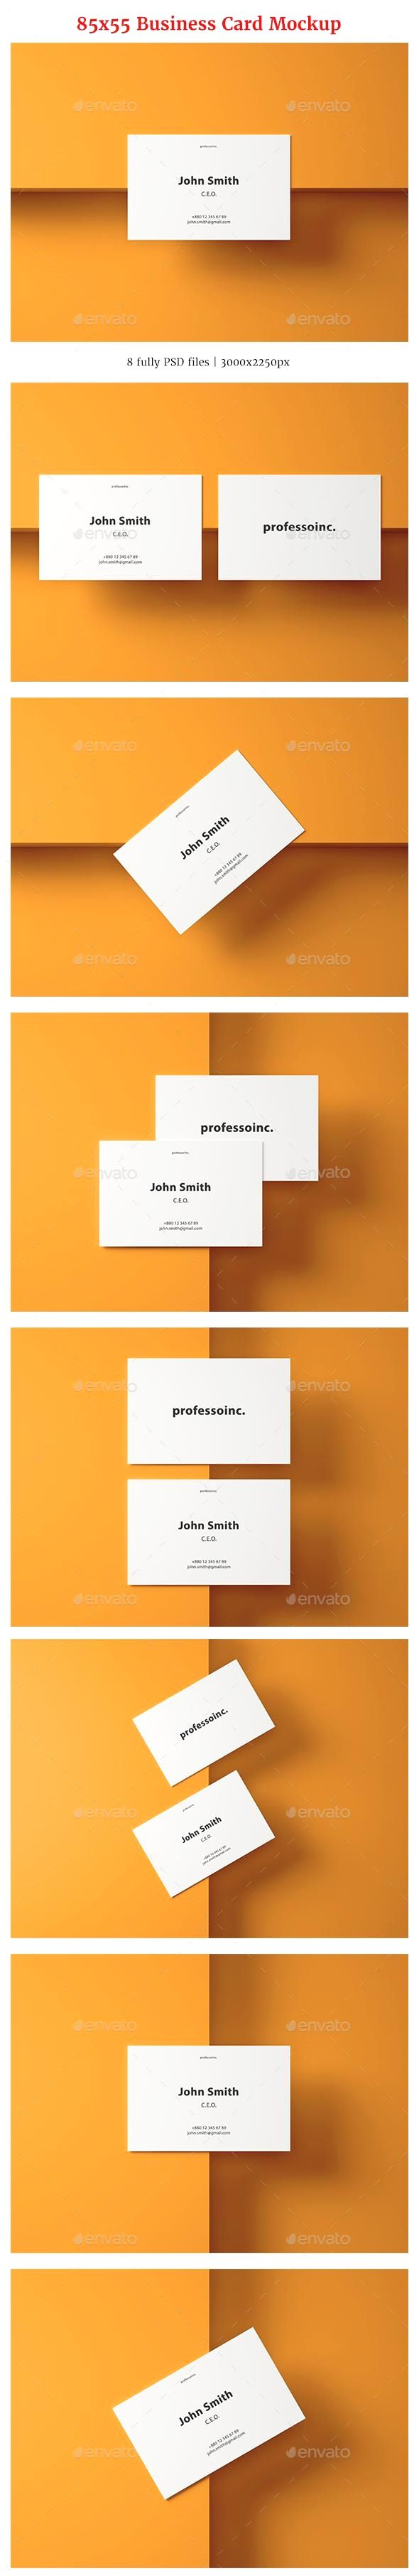 85x55 Business Card Mockup Set 2 Business Card Mock Up Printing Business Cards Business Card Psd